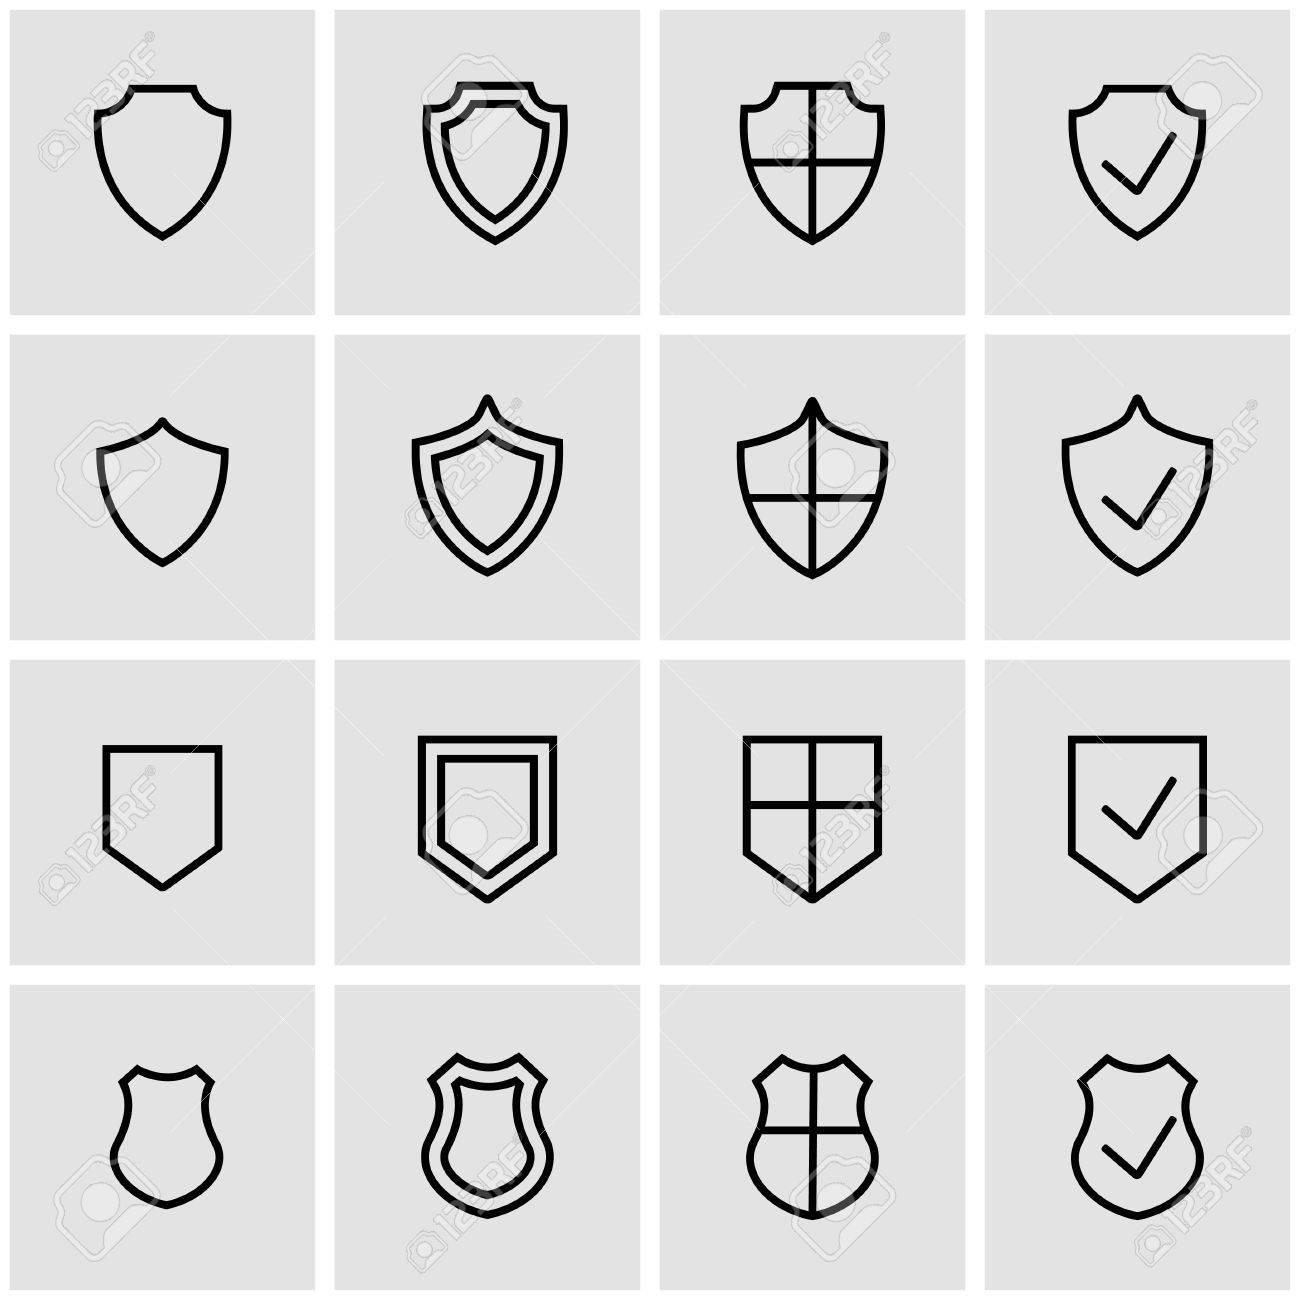 Vector line shield icon set. Shield Icon Object, Shield Icon Picture, Shield Icon Image - stock vector - 52074958